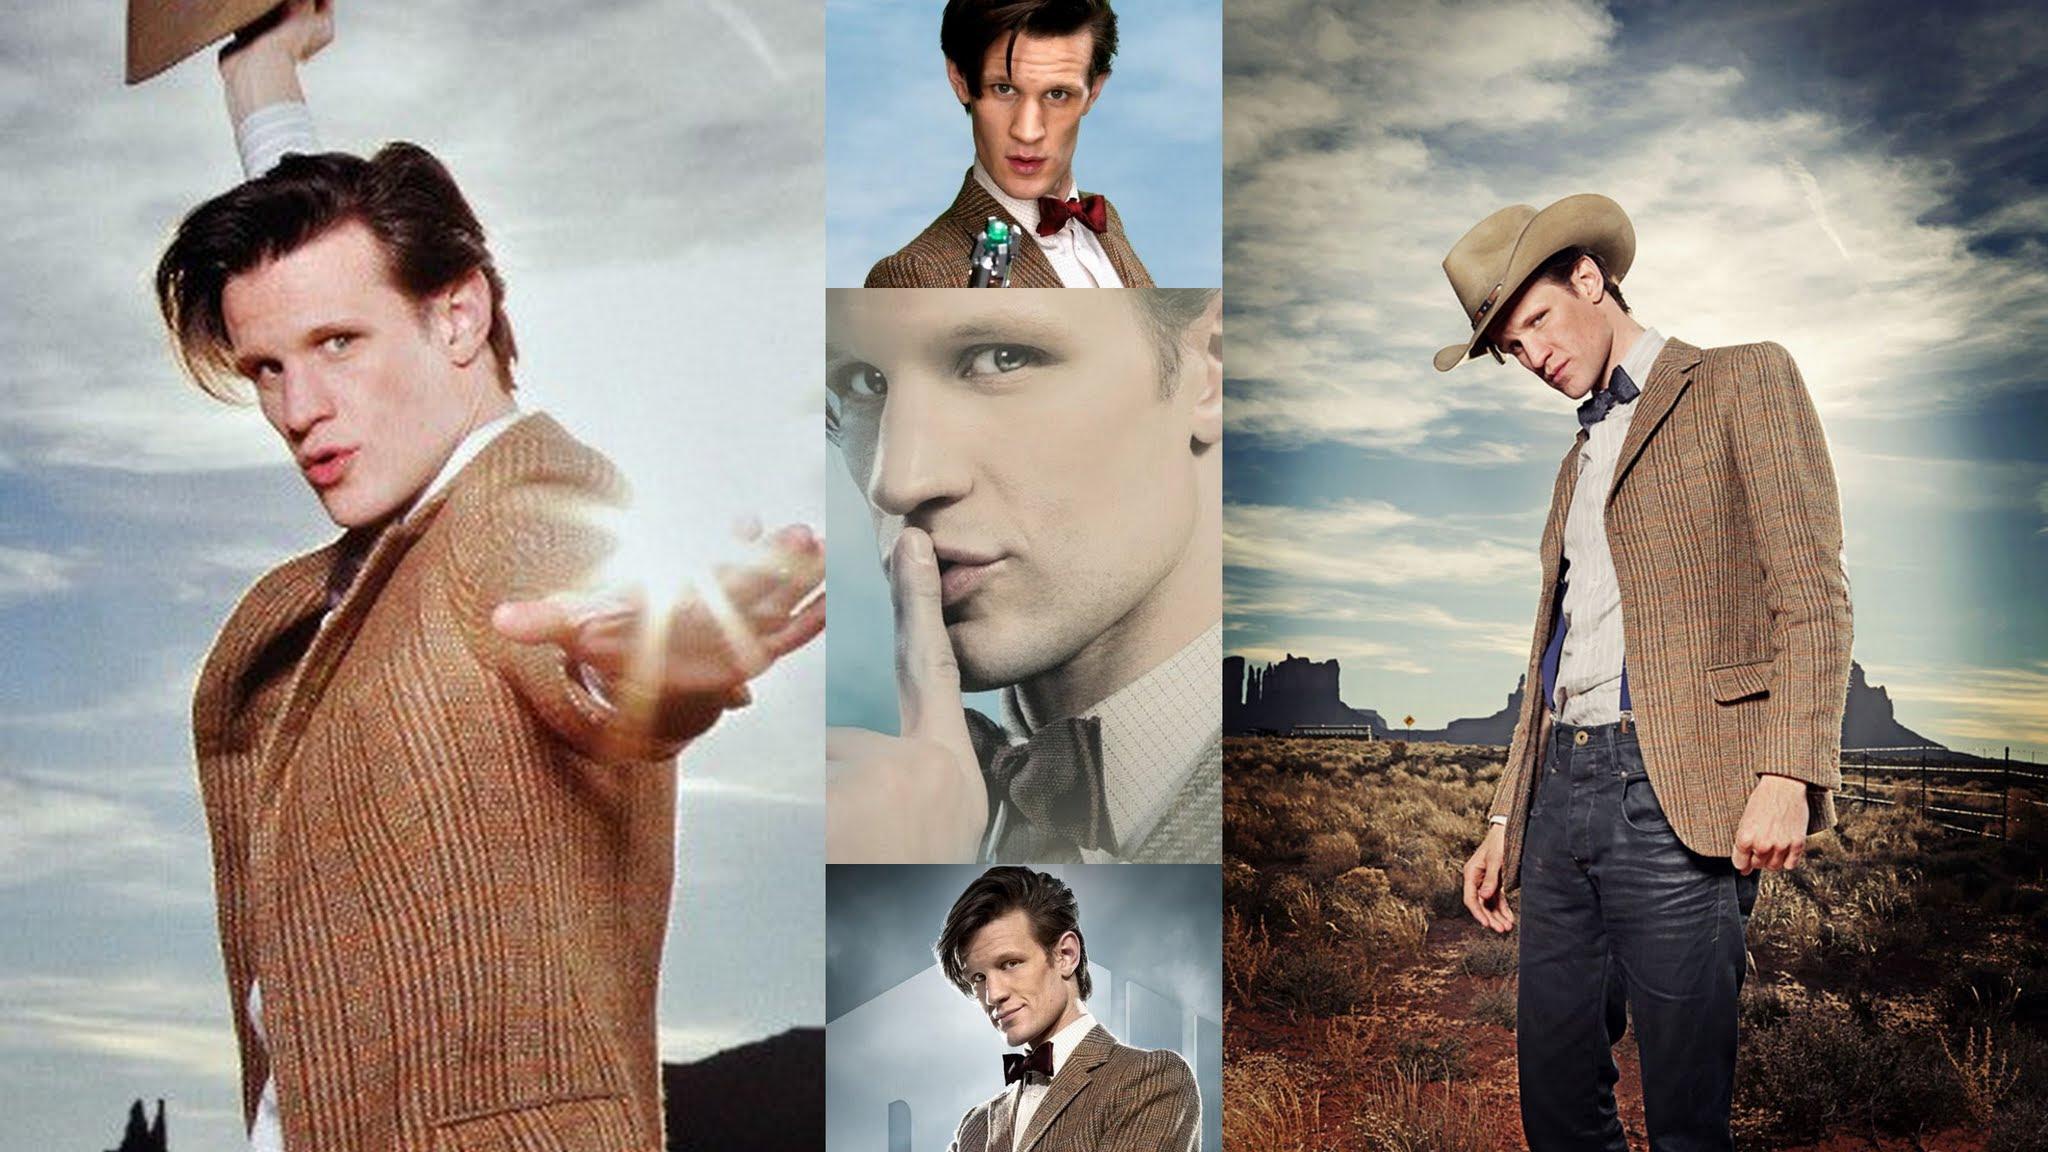 Doctor Who Matt Smith Wallpapers Wallpaper 2048x1152